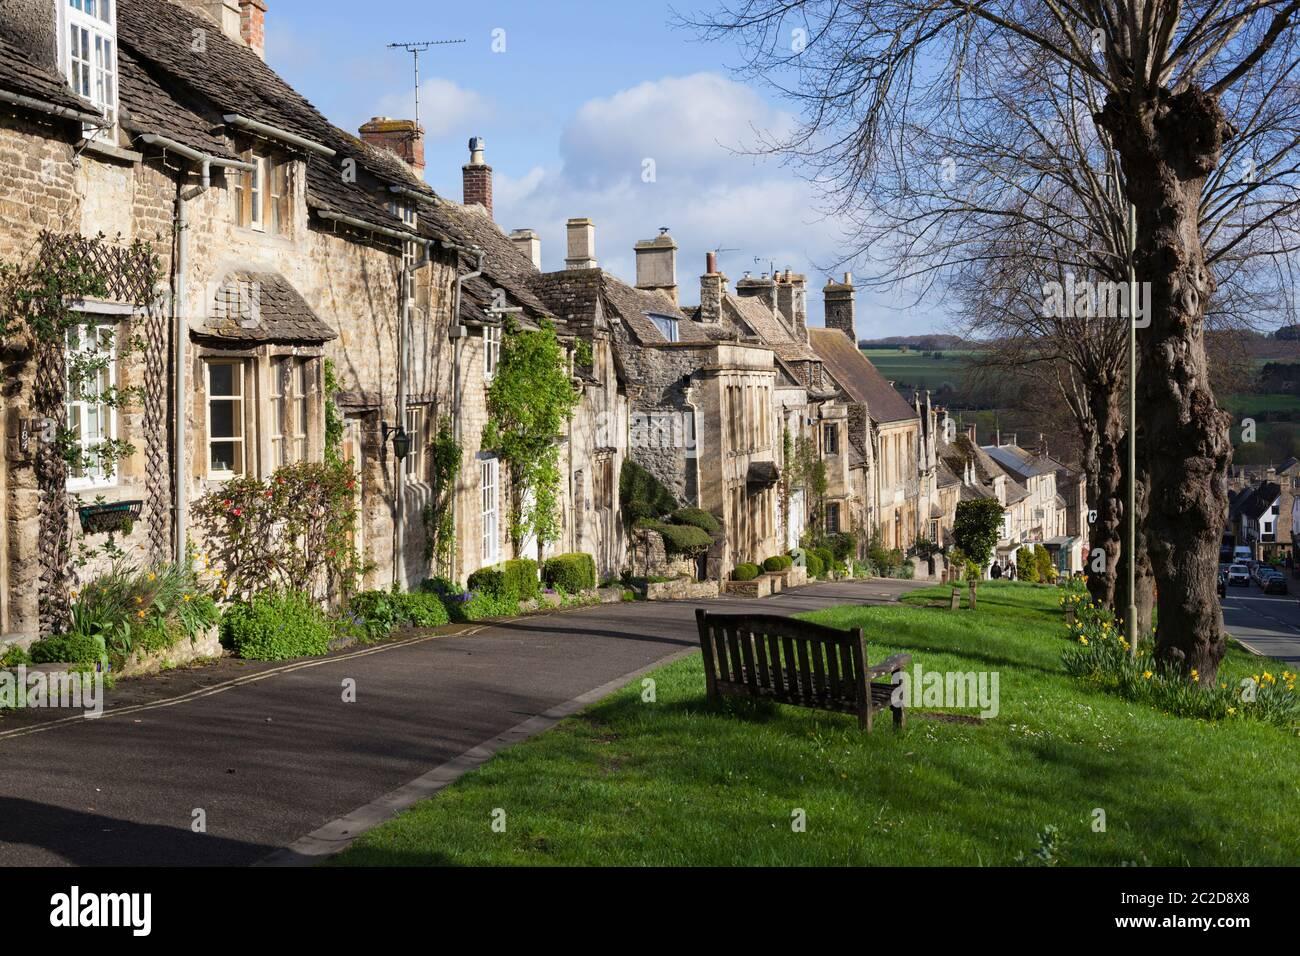 Cotswold cabañas a lo largo de la colina, Burford, Cotswolds, Oxfordshire, Inglaterra, Reino Unido, Europa Foto de stock